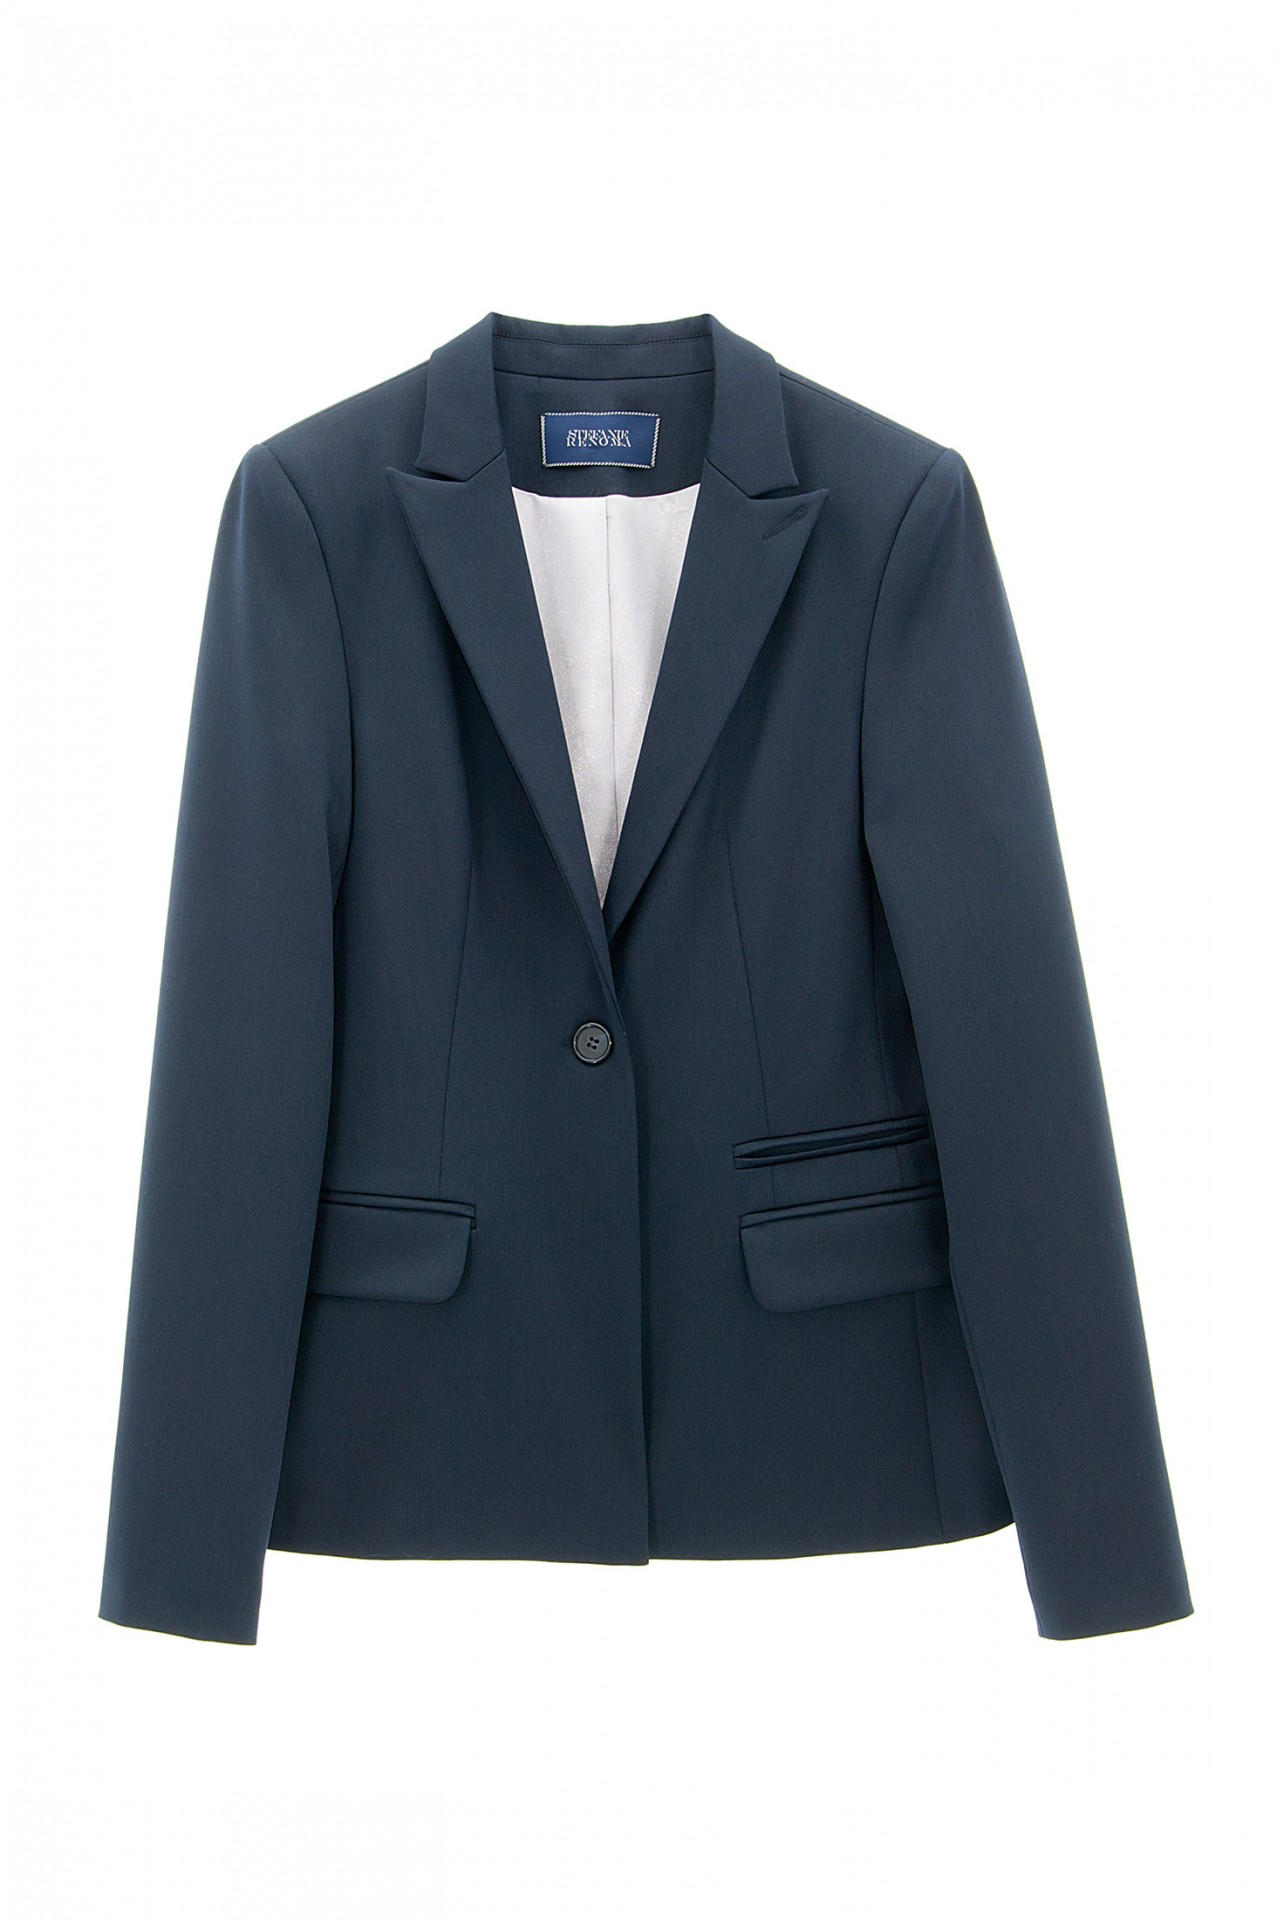 blazer femme veste femme bleu marine stefanie stefanie renoma. Black Bedroom Furniture Sets. Home Design Ideas